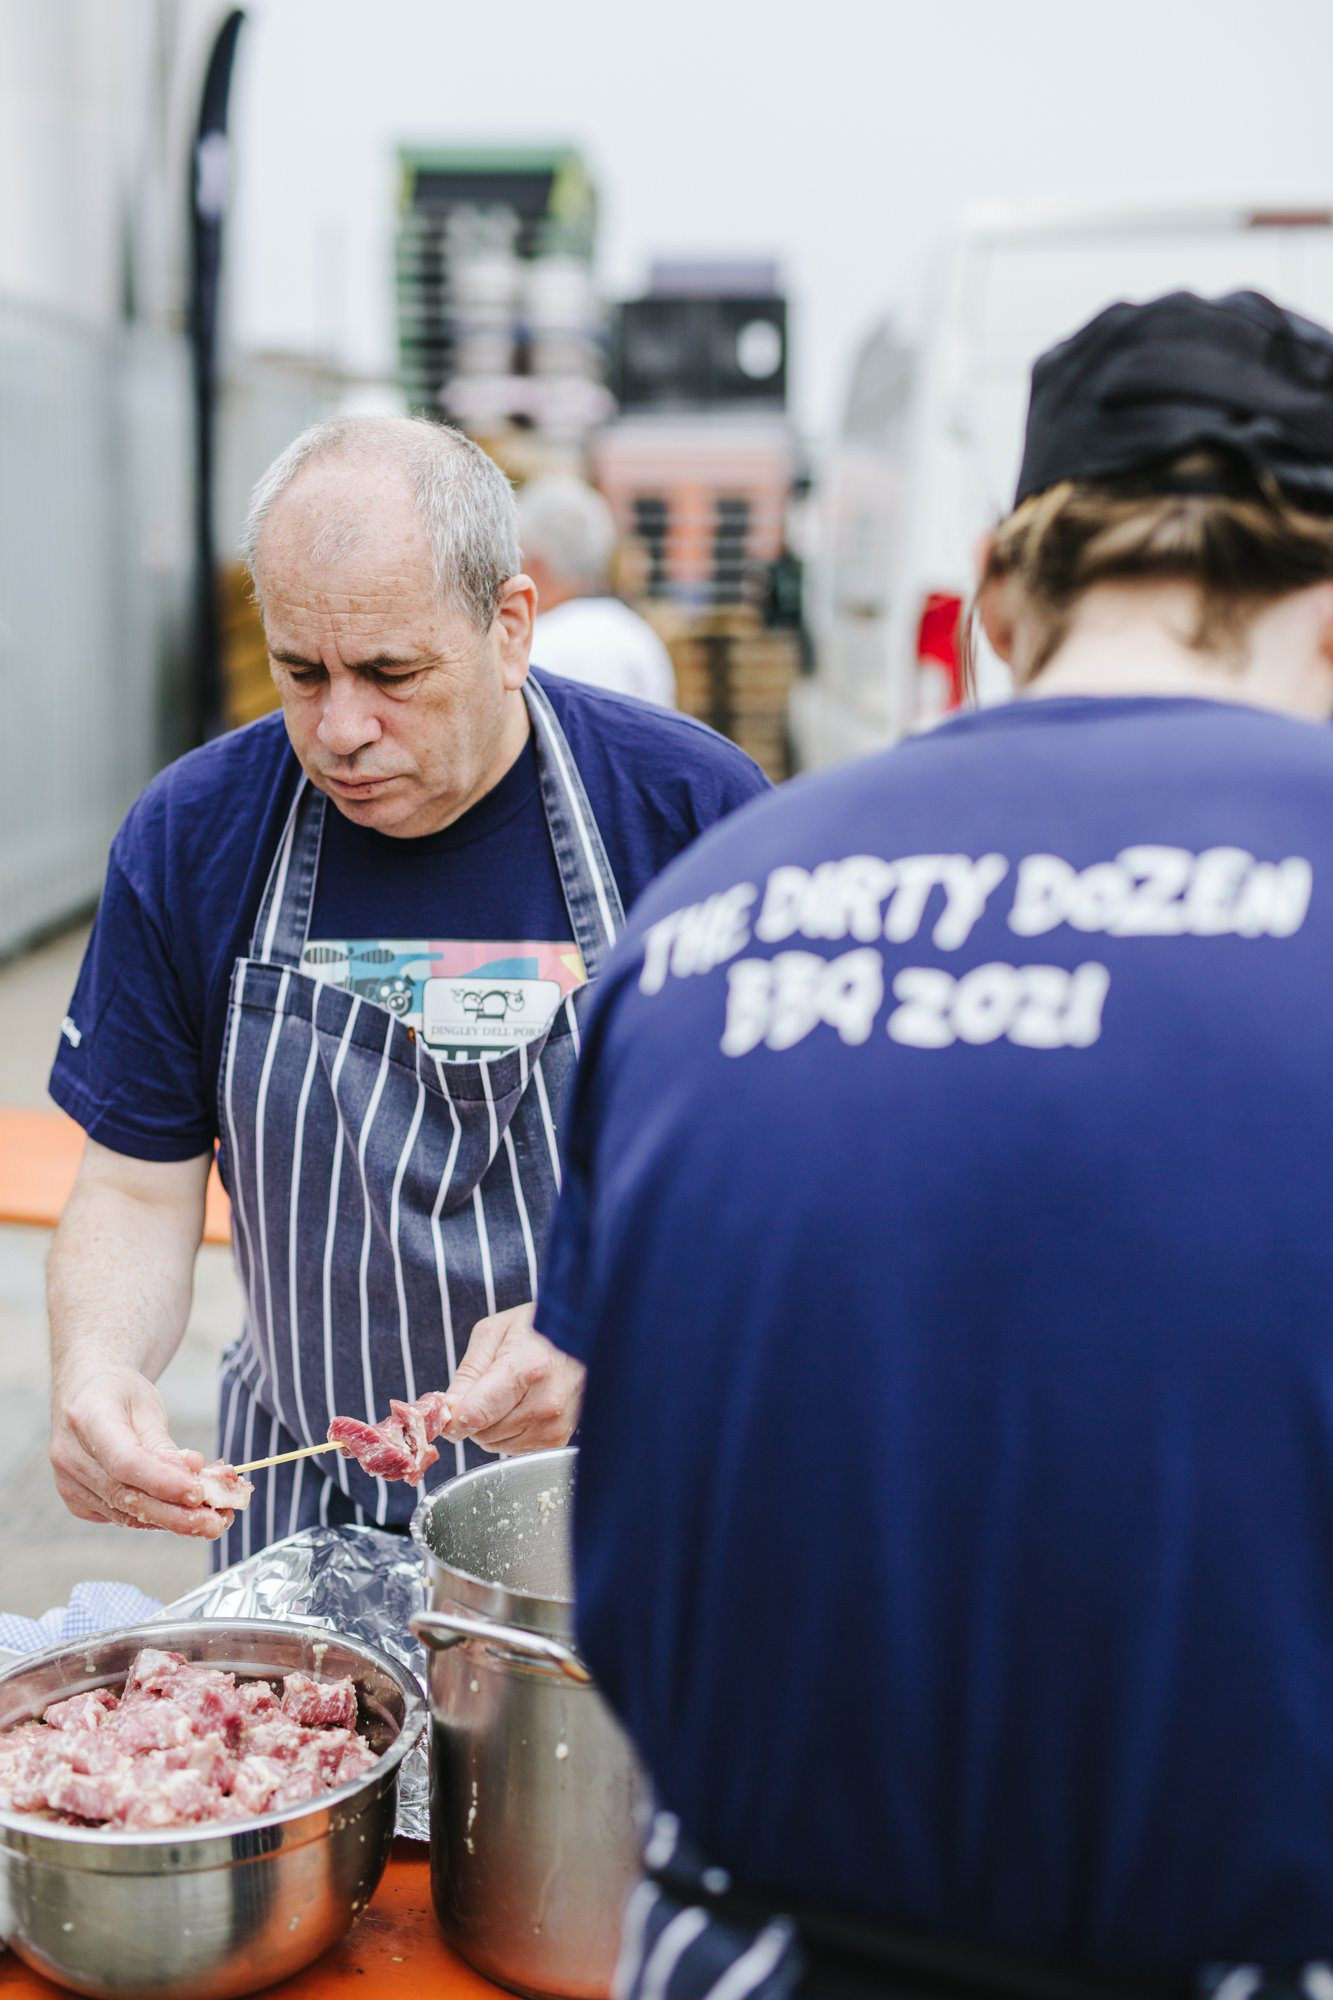 The Dirty Dozen support celebrity chefs